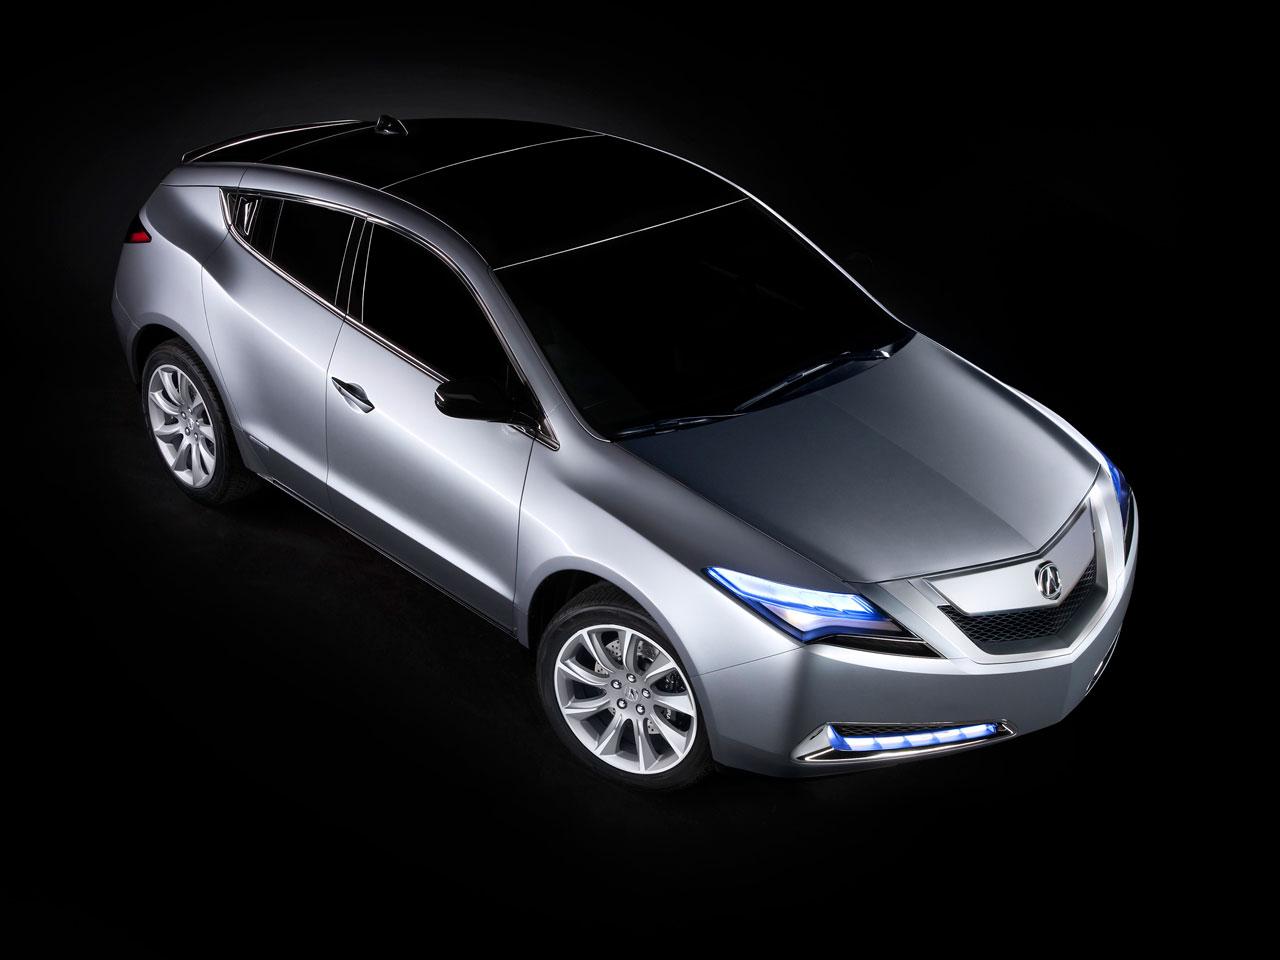 2009 Acura ZDX - Concepts